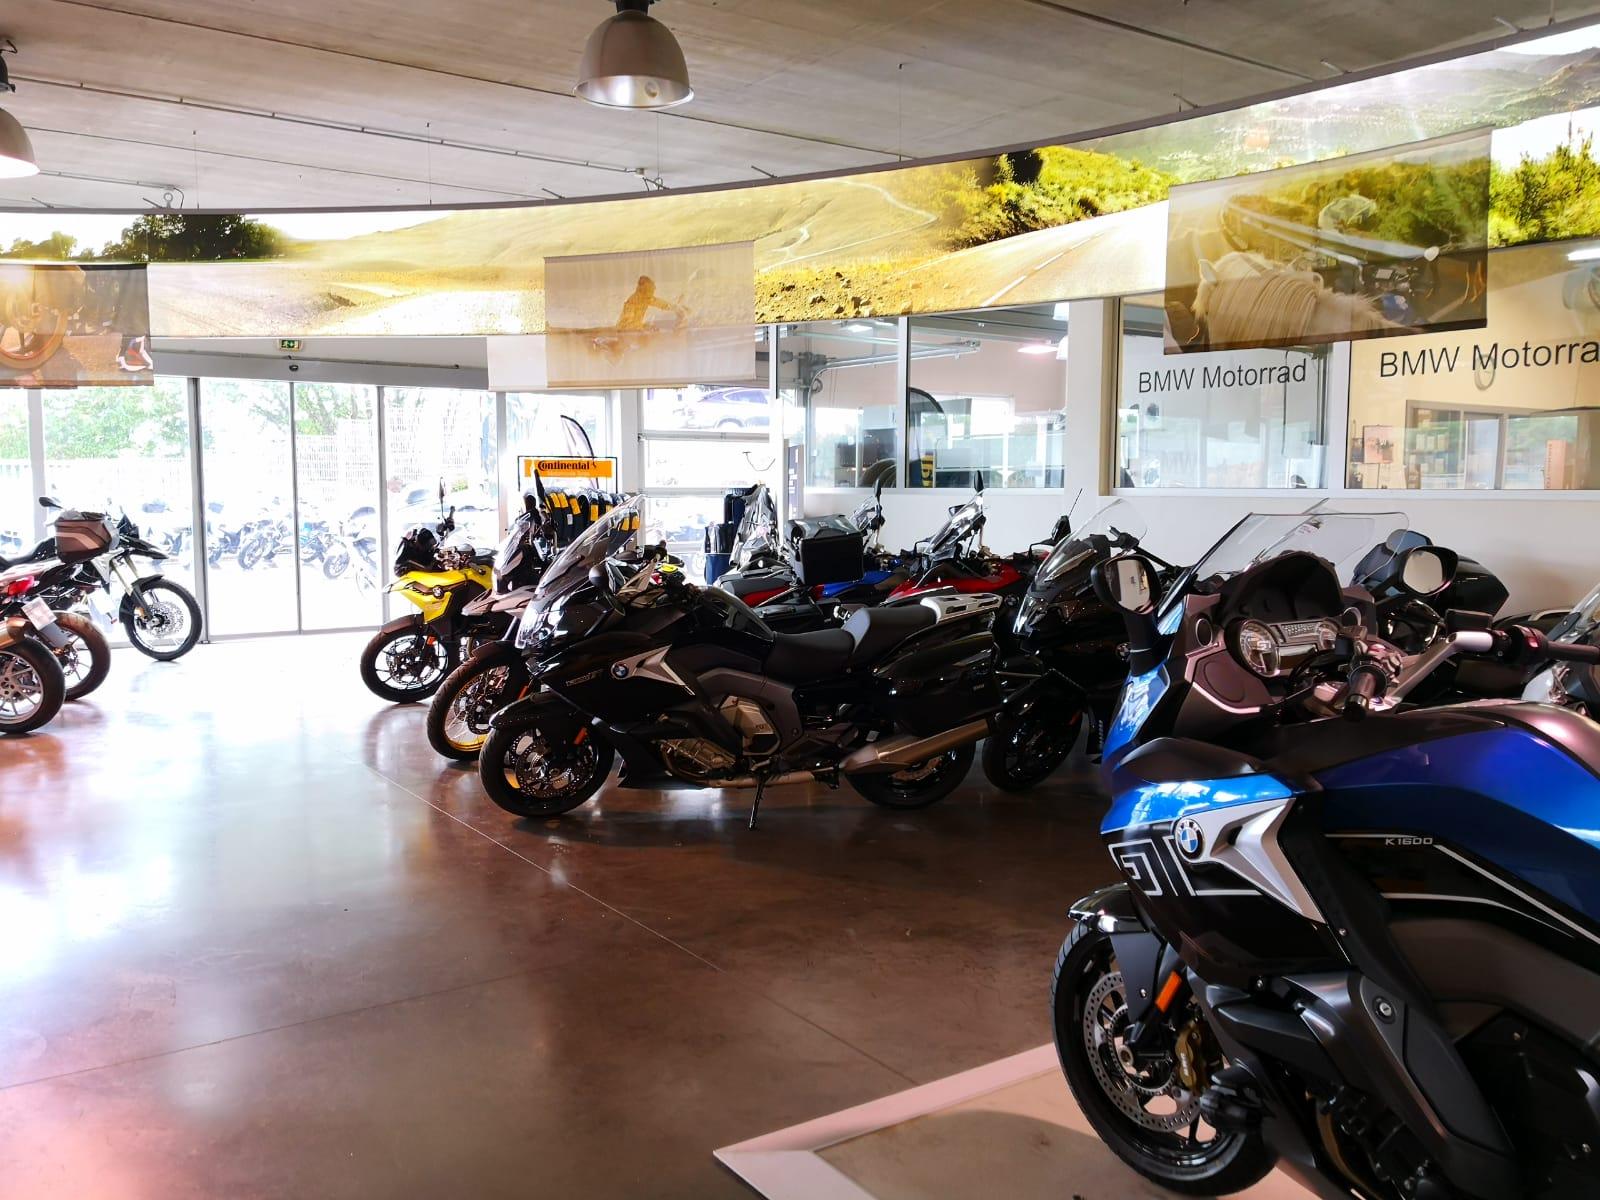 Bmw Savy Moto Besancon Concessionnaire Bmw Besancon Moto